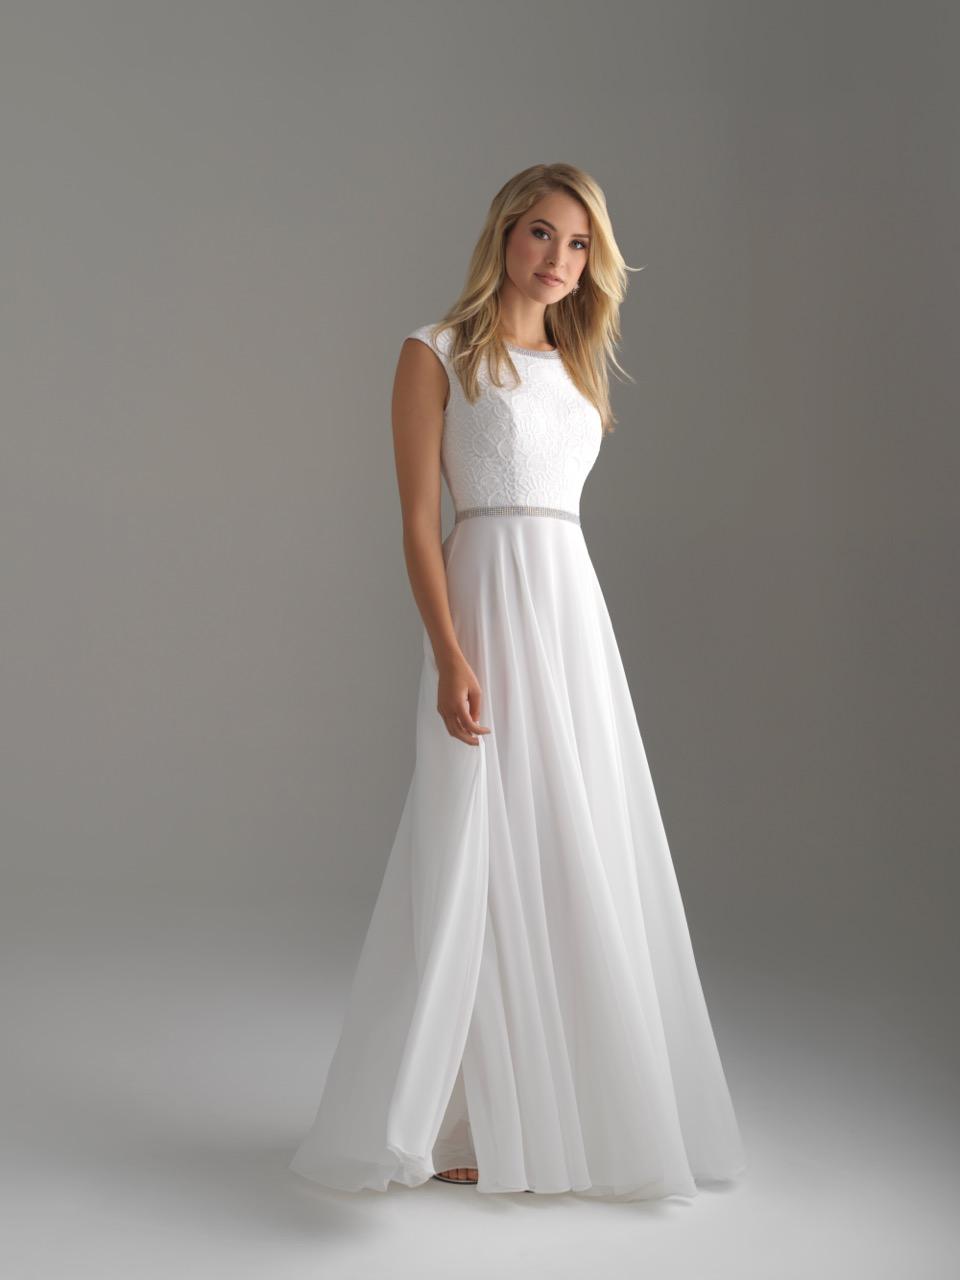 Allure 18-802M White Modest Prom